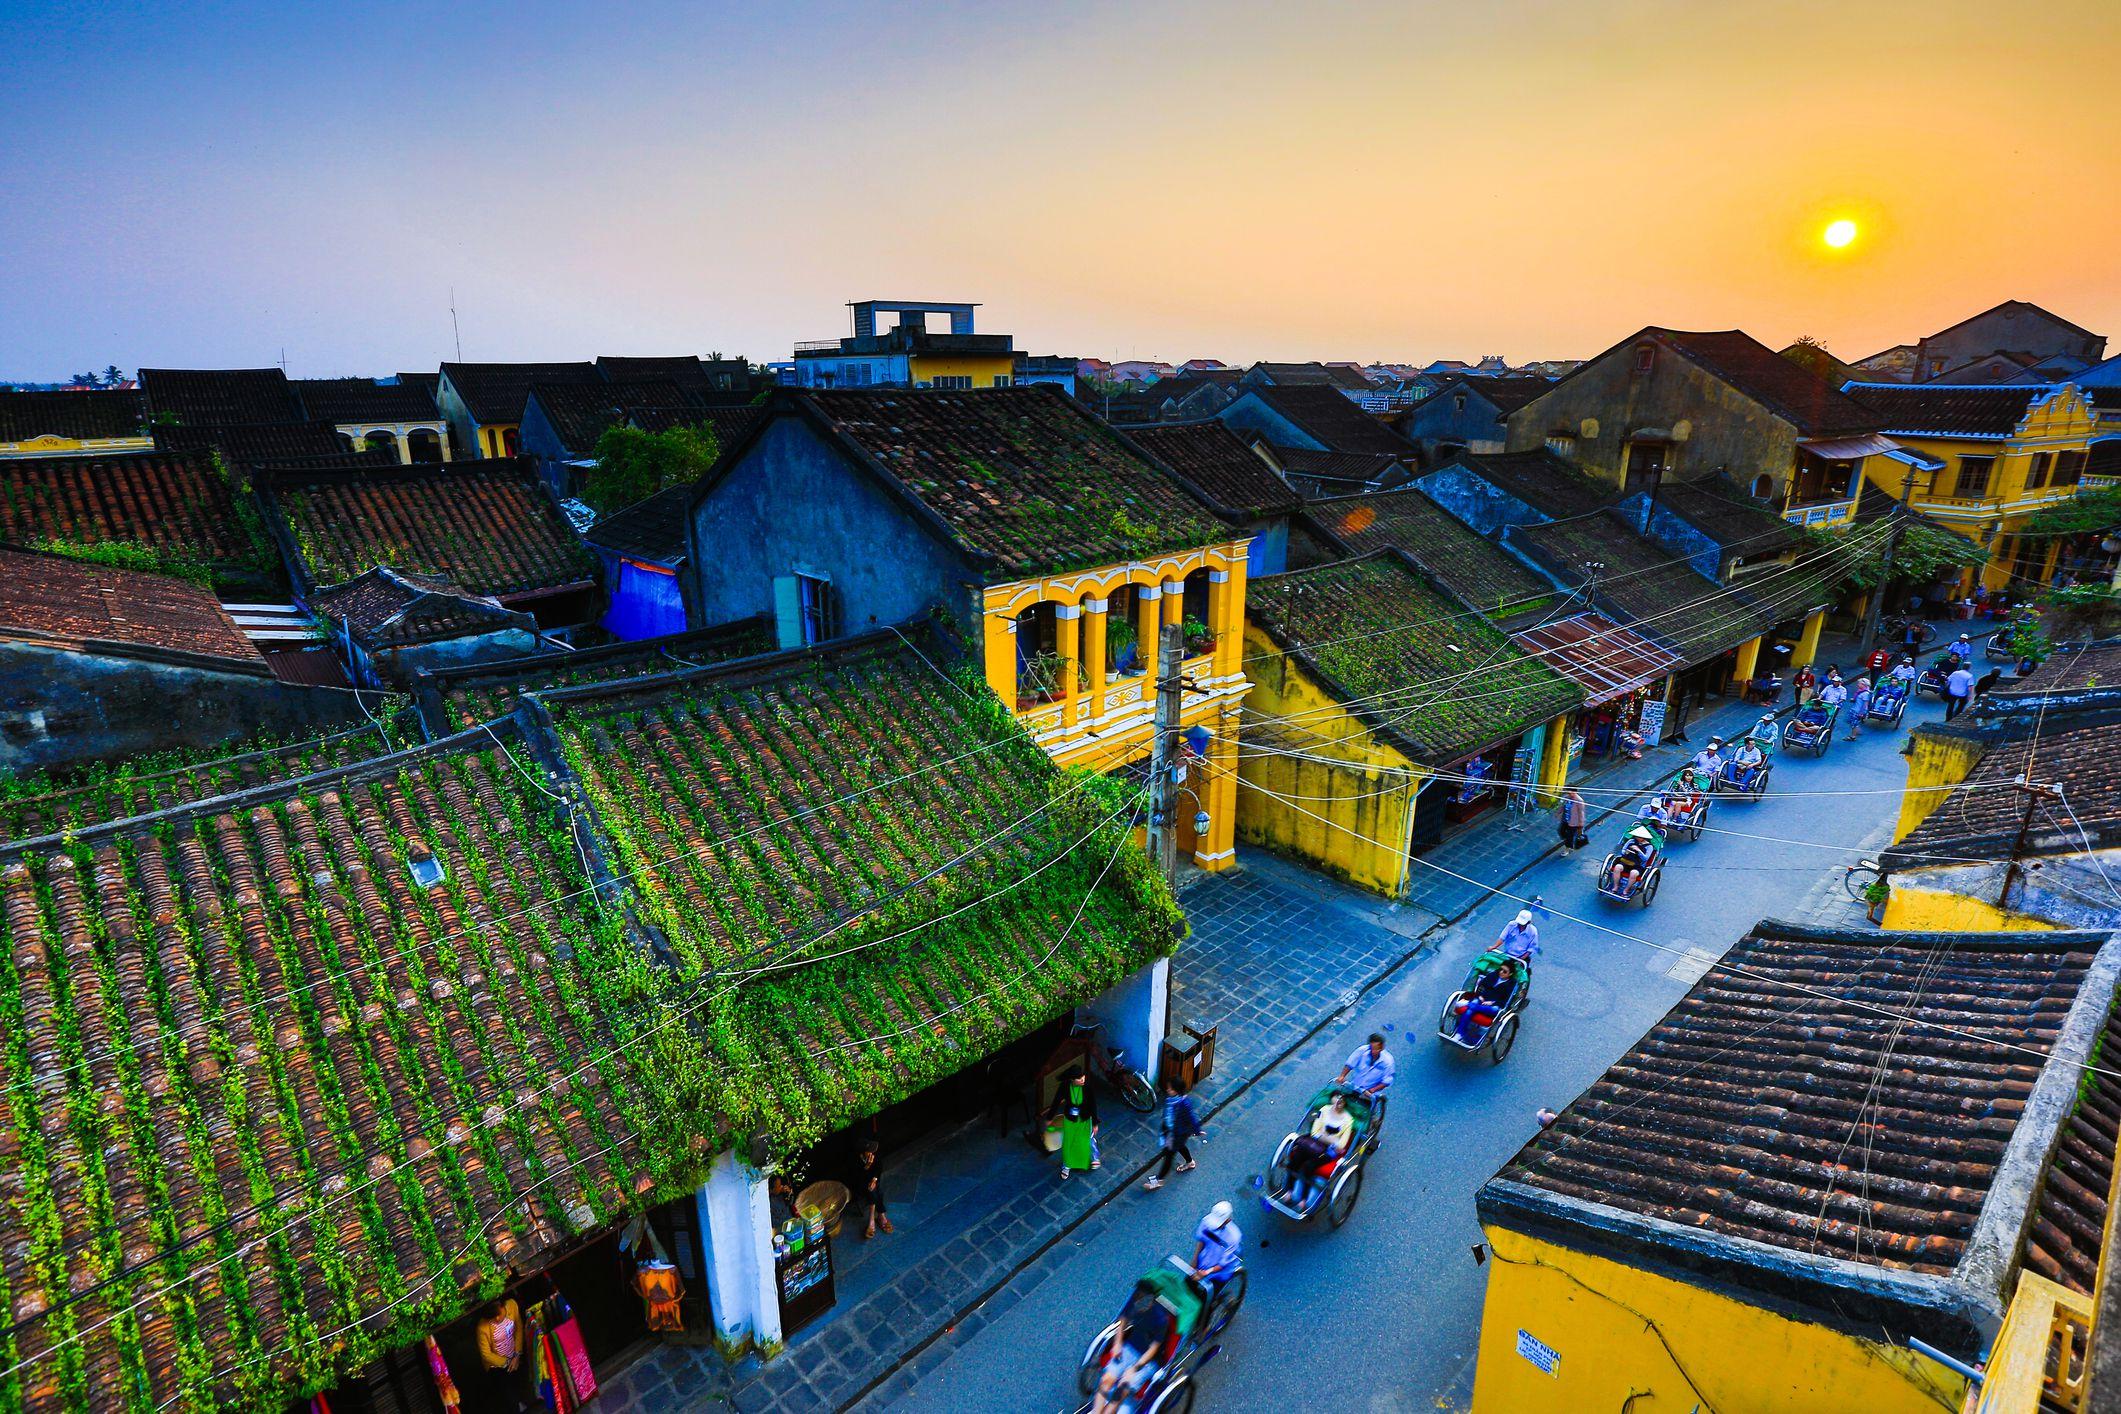 Sunset in Hoian ancient town, Vietnam